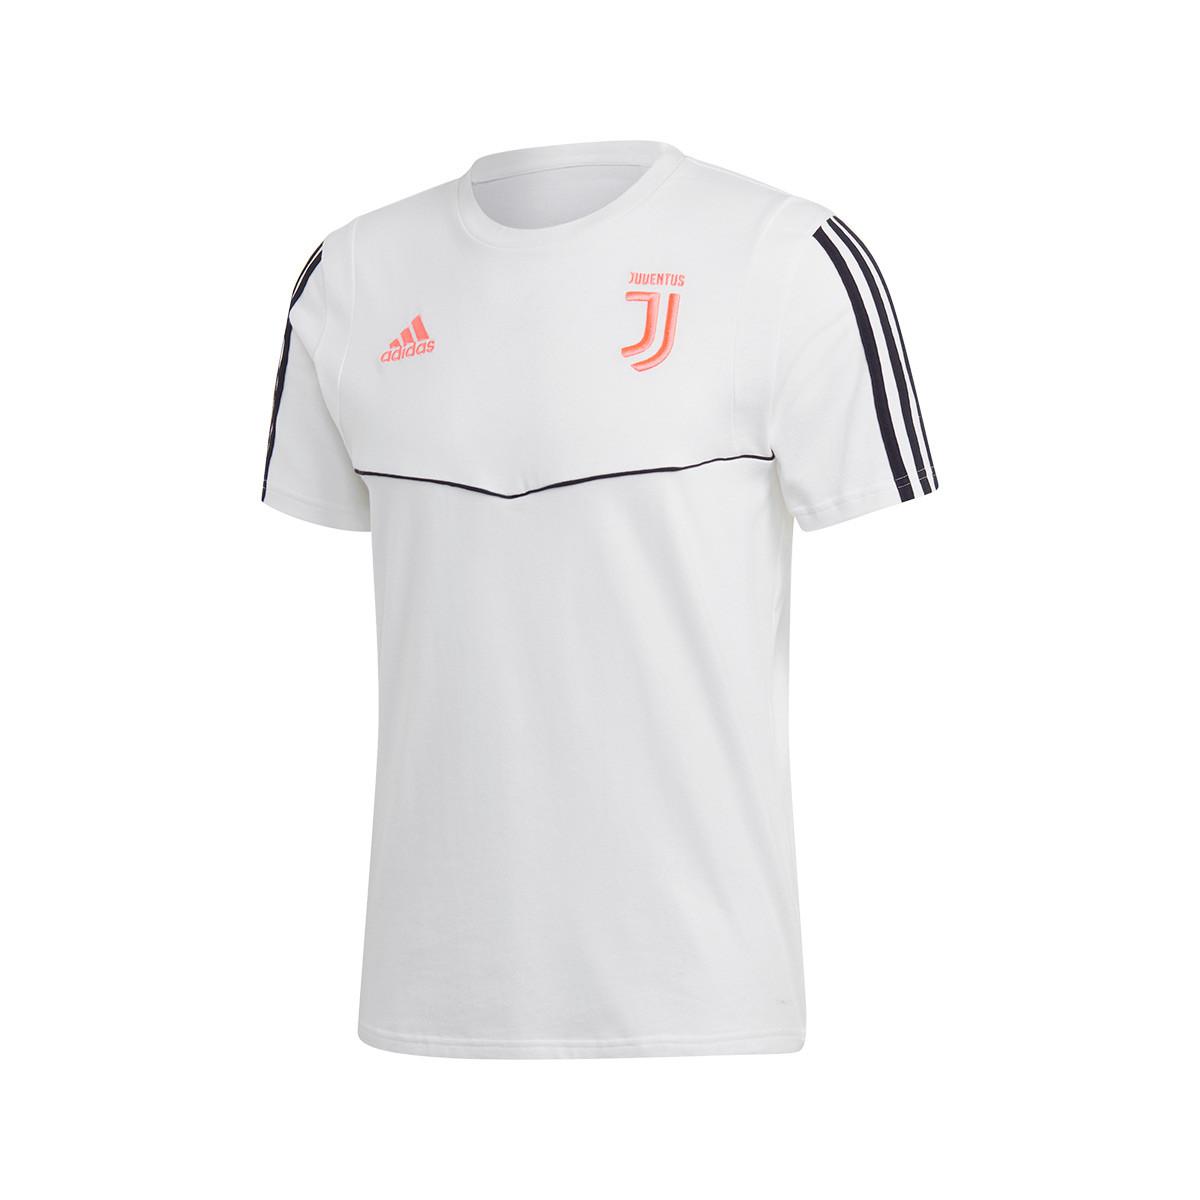 the best attitude 4b250 97ea7 Camiseta Juventus 2019-2020 White-Black